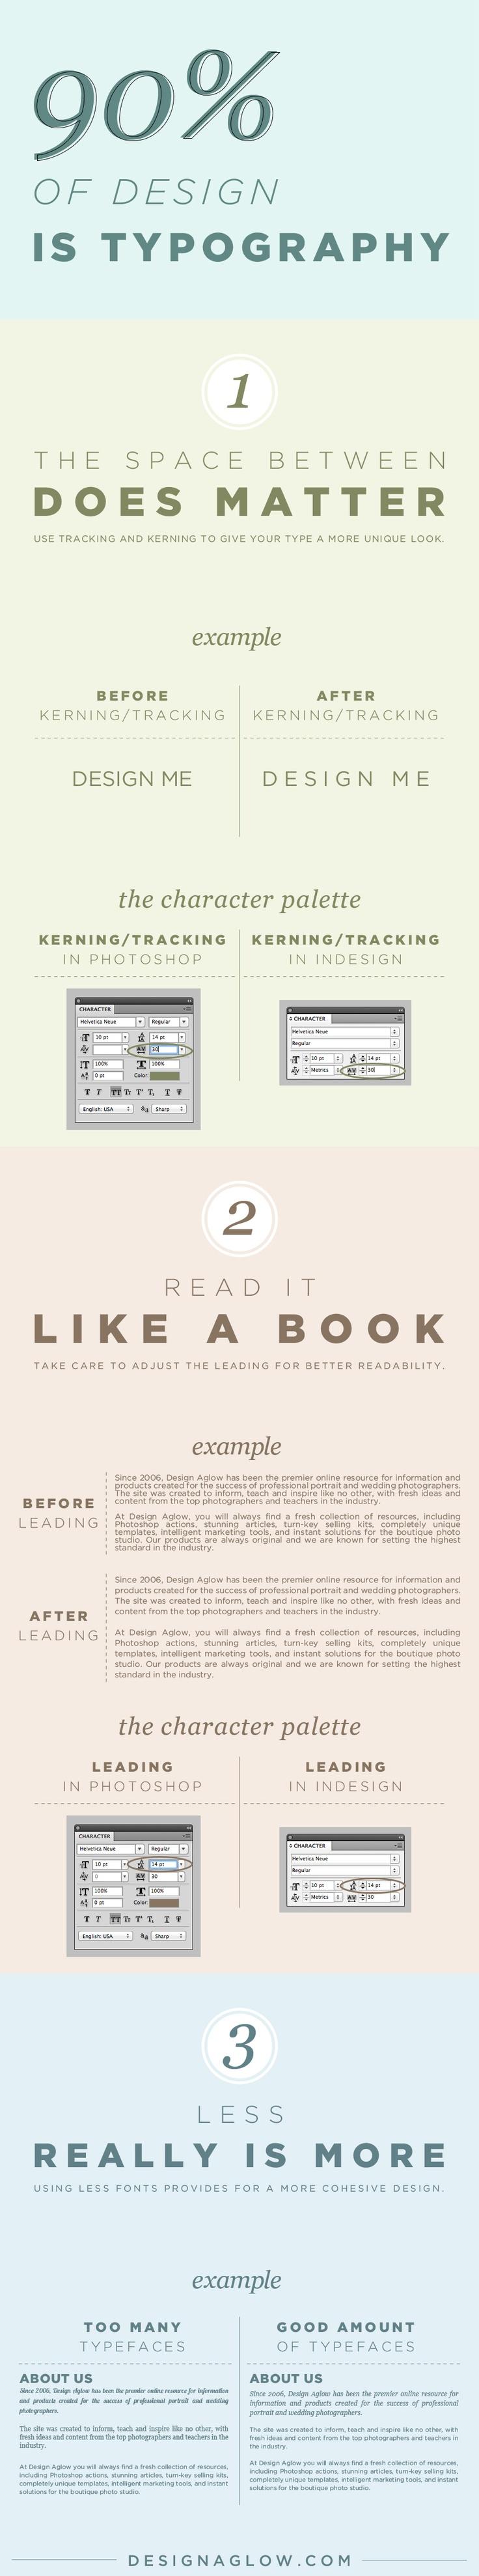 design is typography